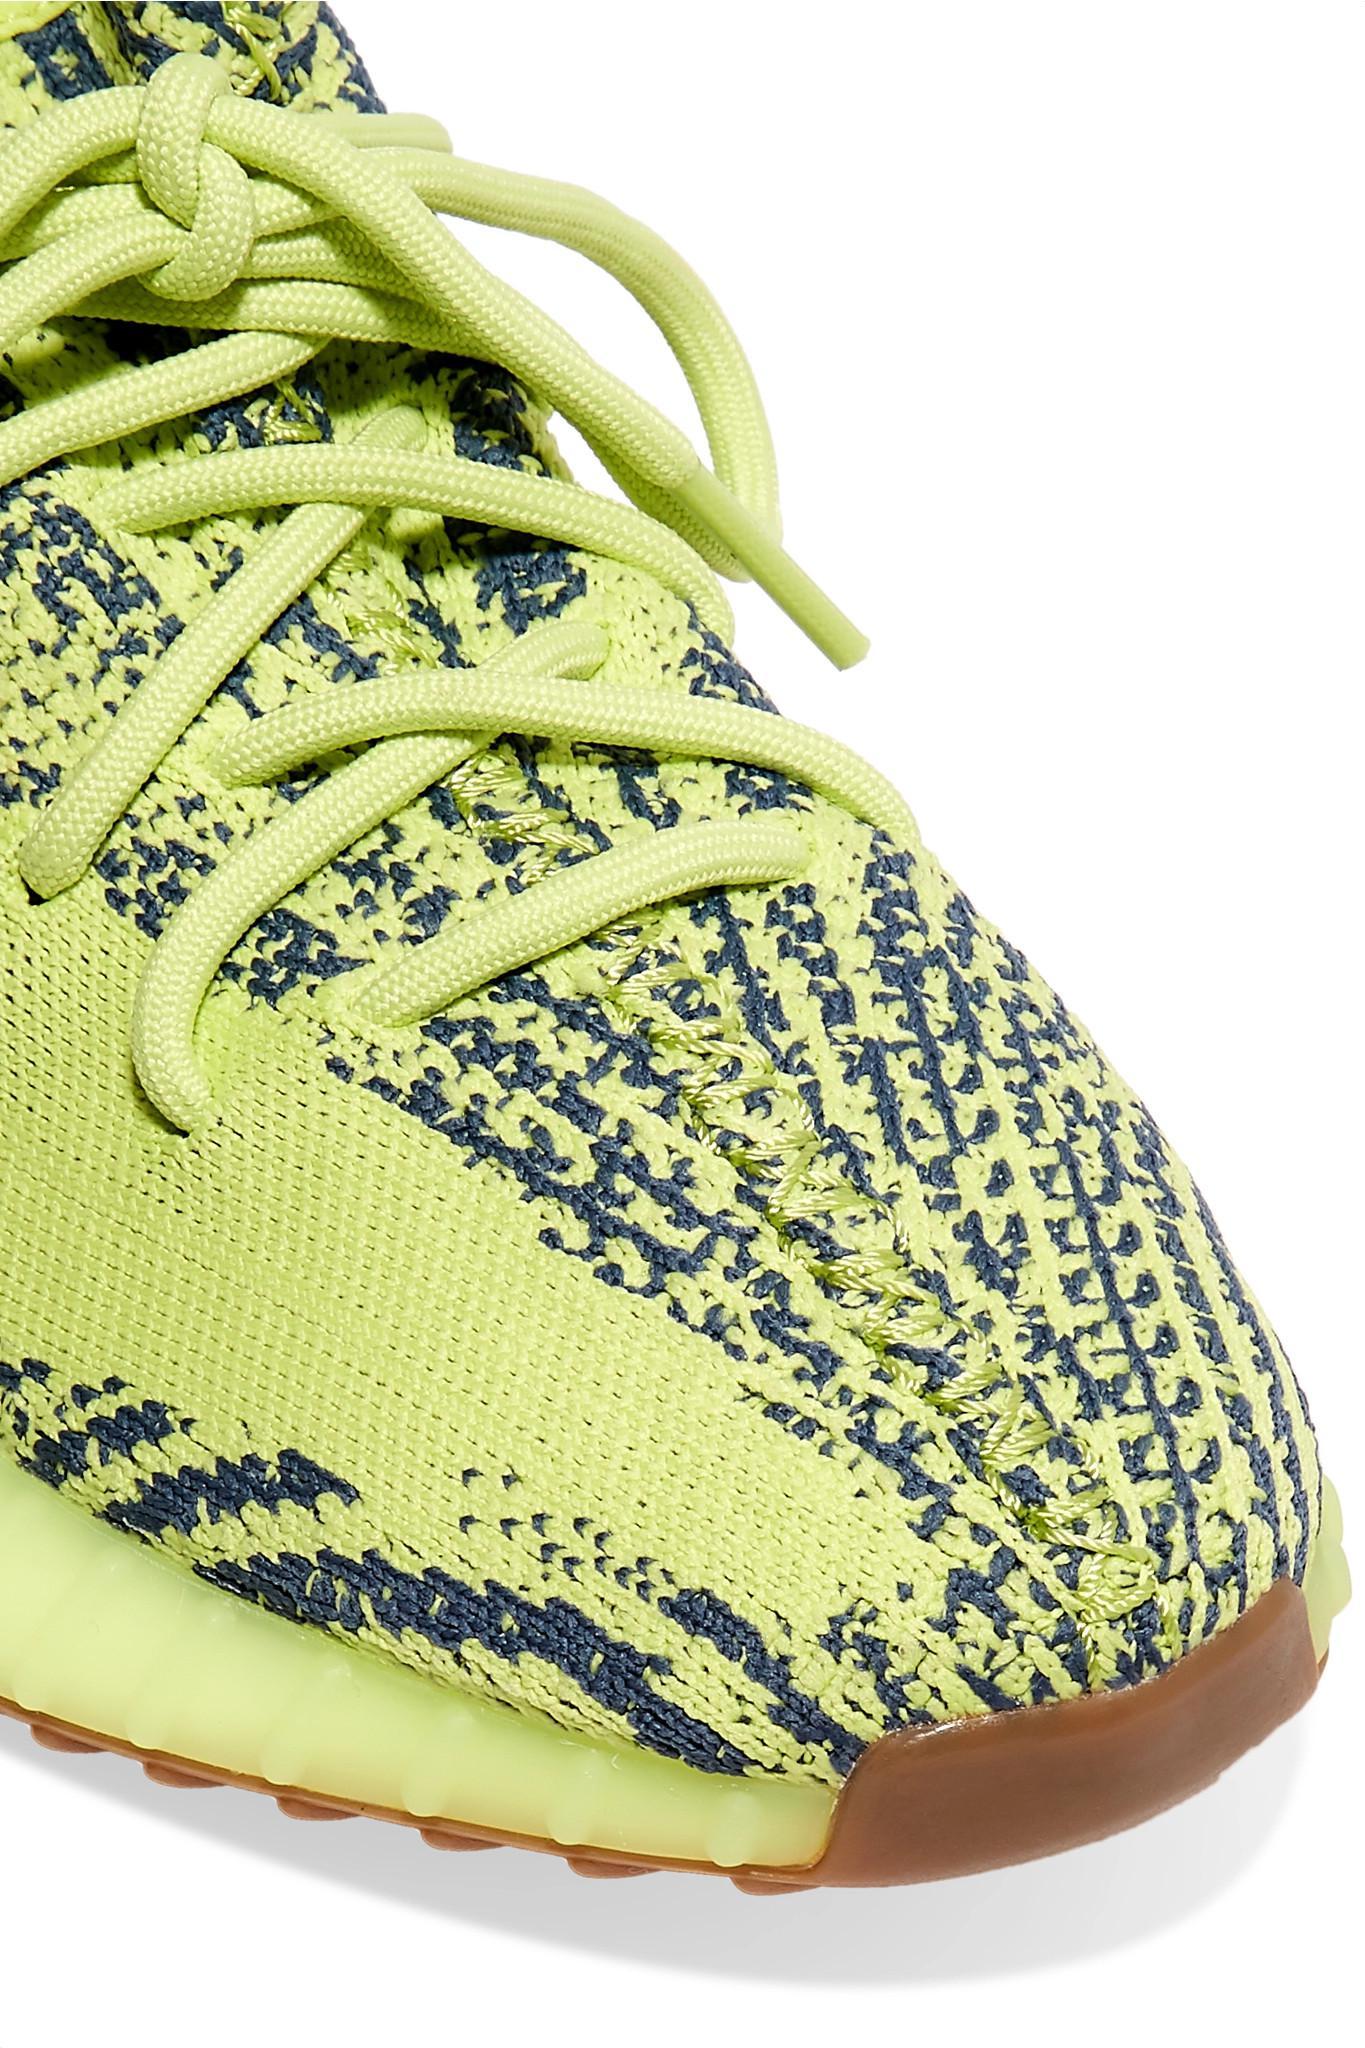 82c73426 adidas Originals Yeezy Boost 350 V2 Zebra-intarsia Primeknit ...